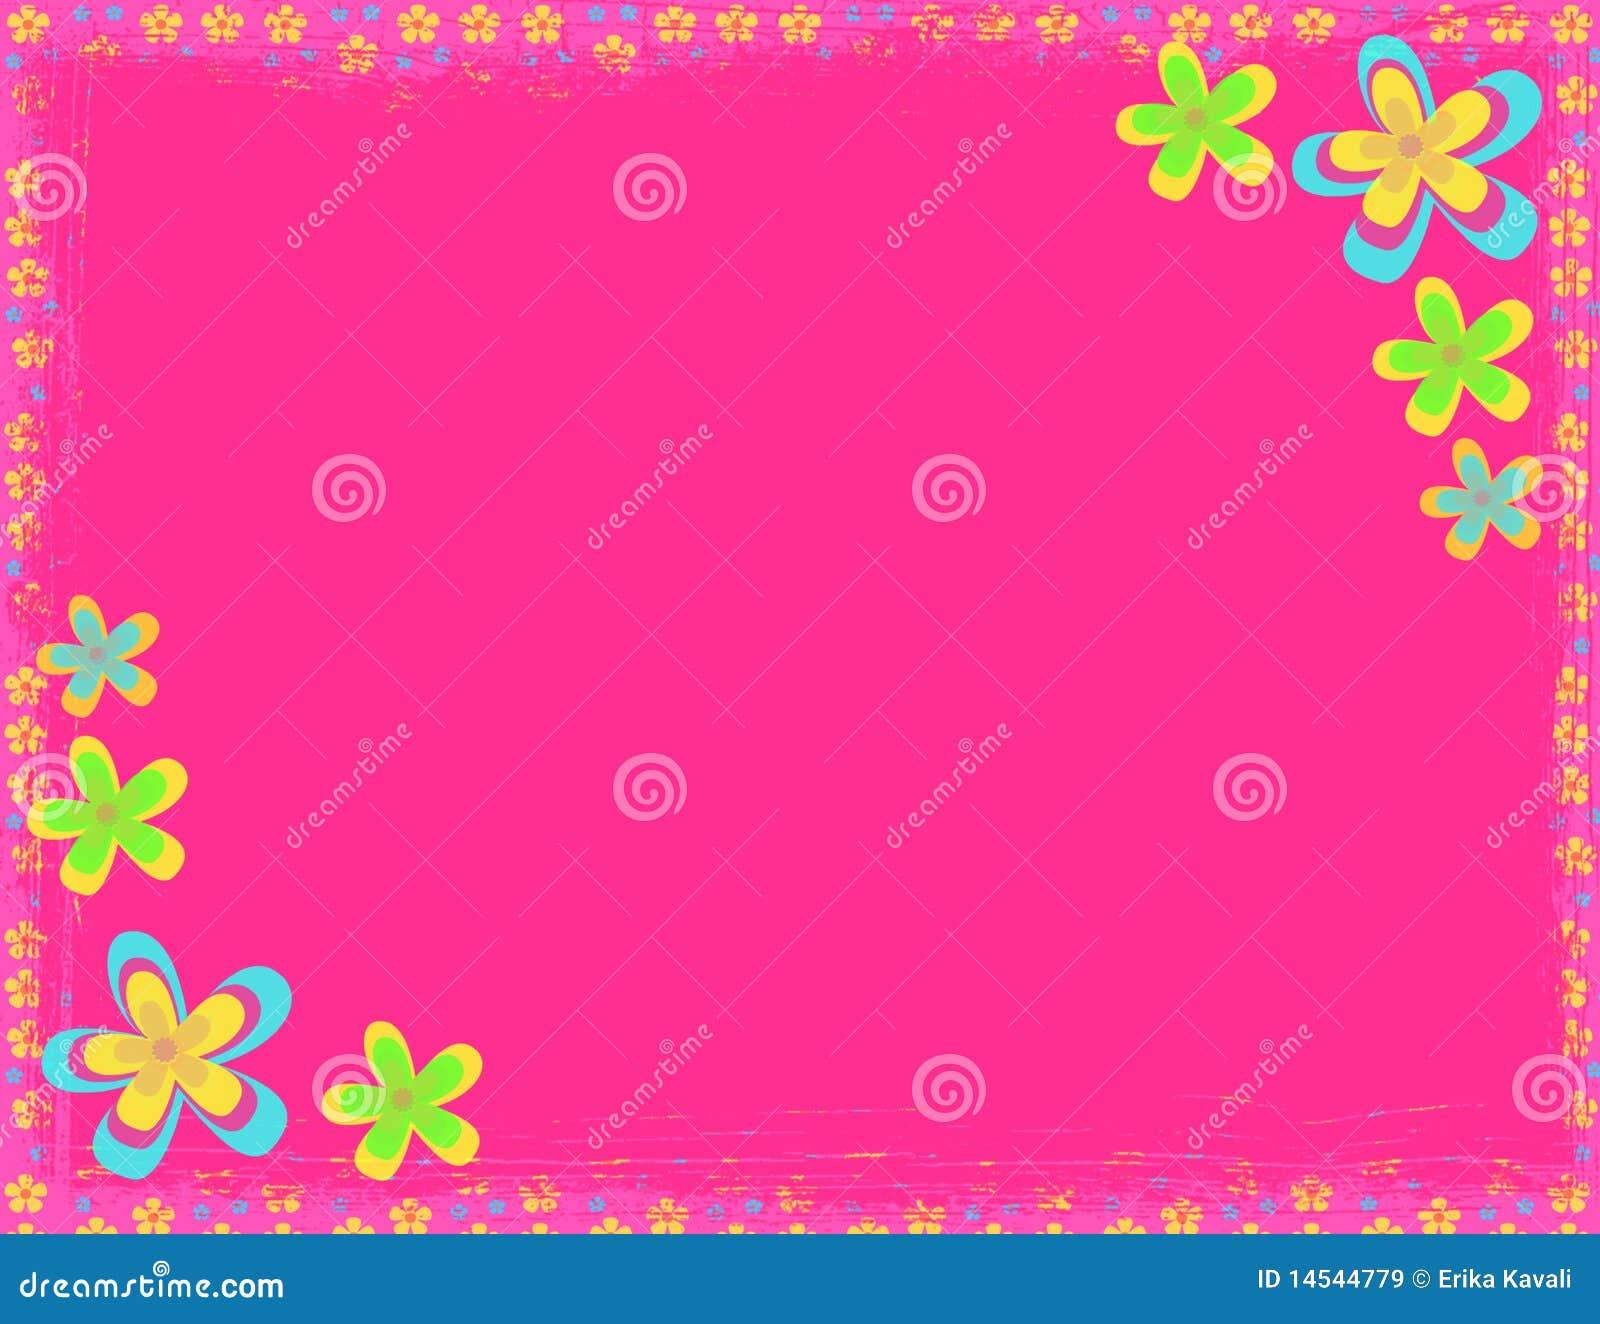 Pink flower hippie background stock illustration illustration of pink flower hippie background voltagebd Choice Image